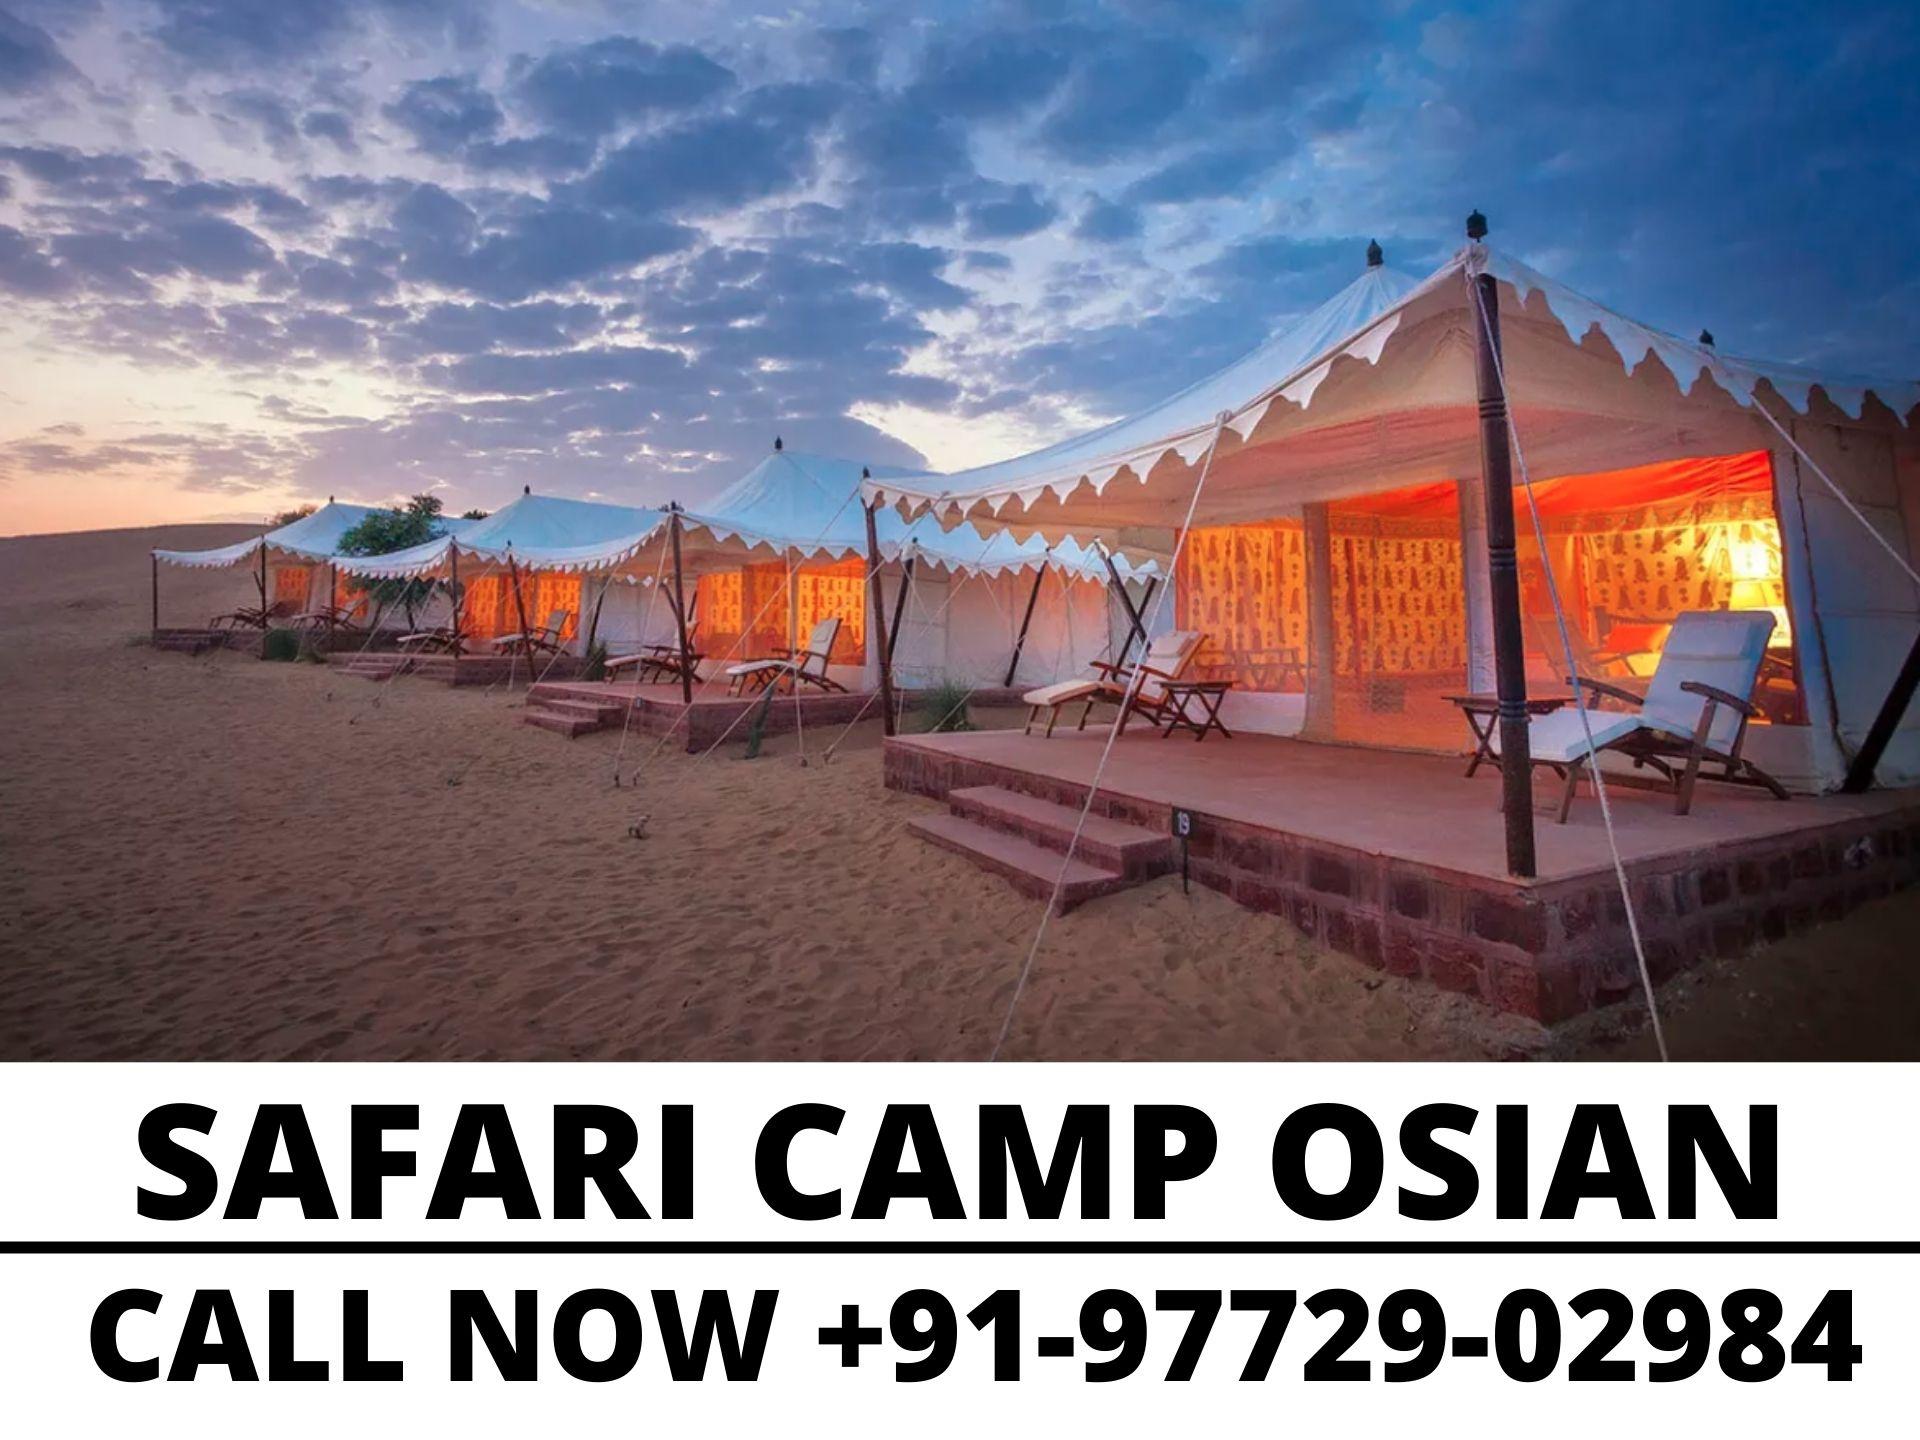 safari camp in ossian